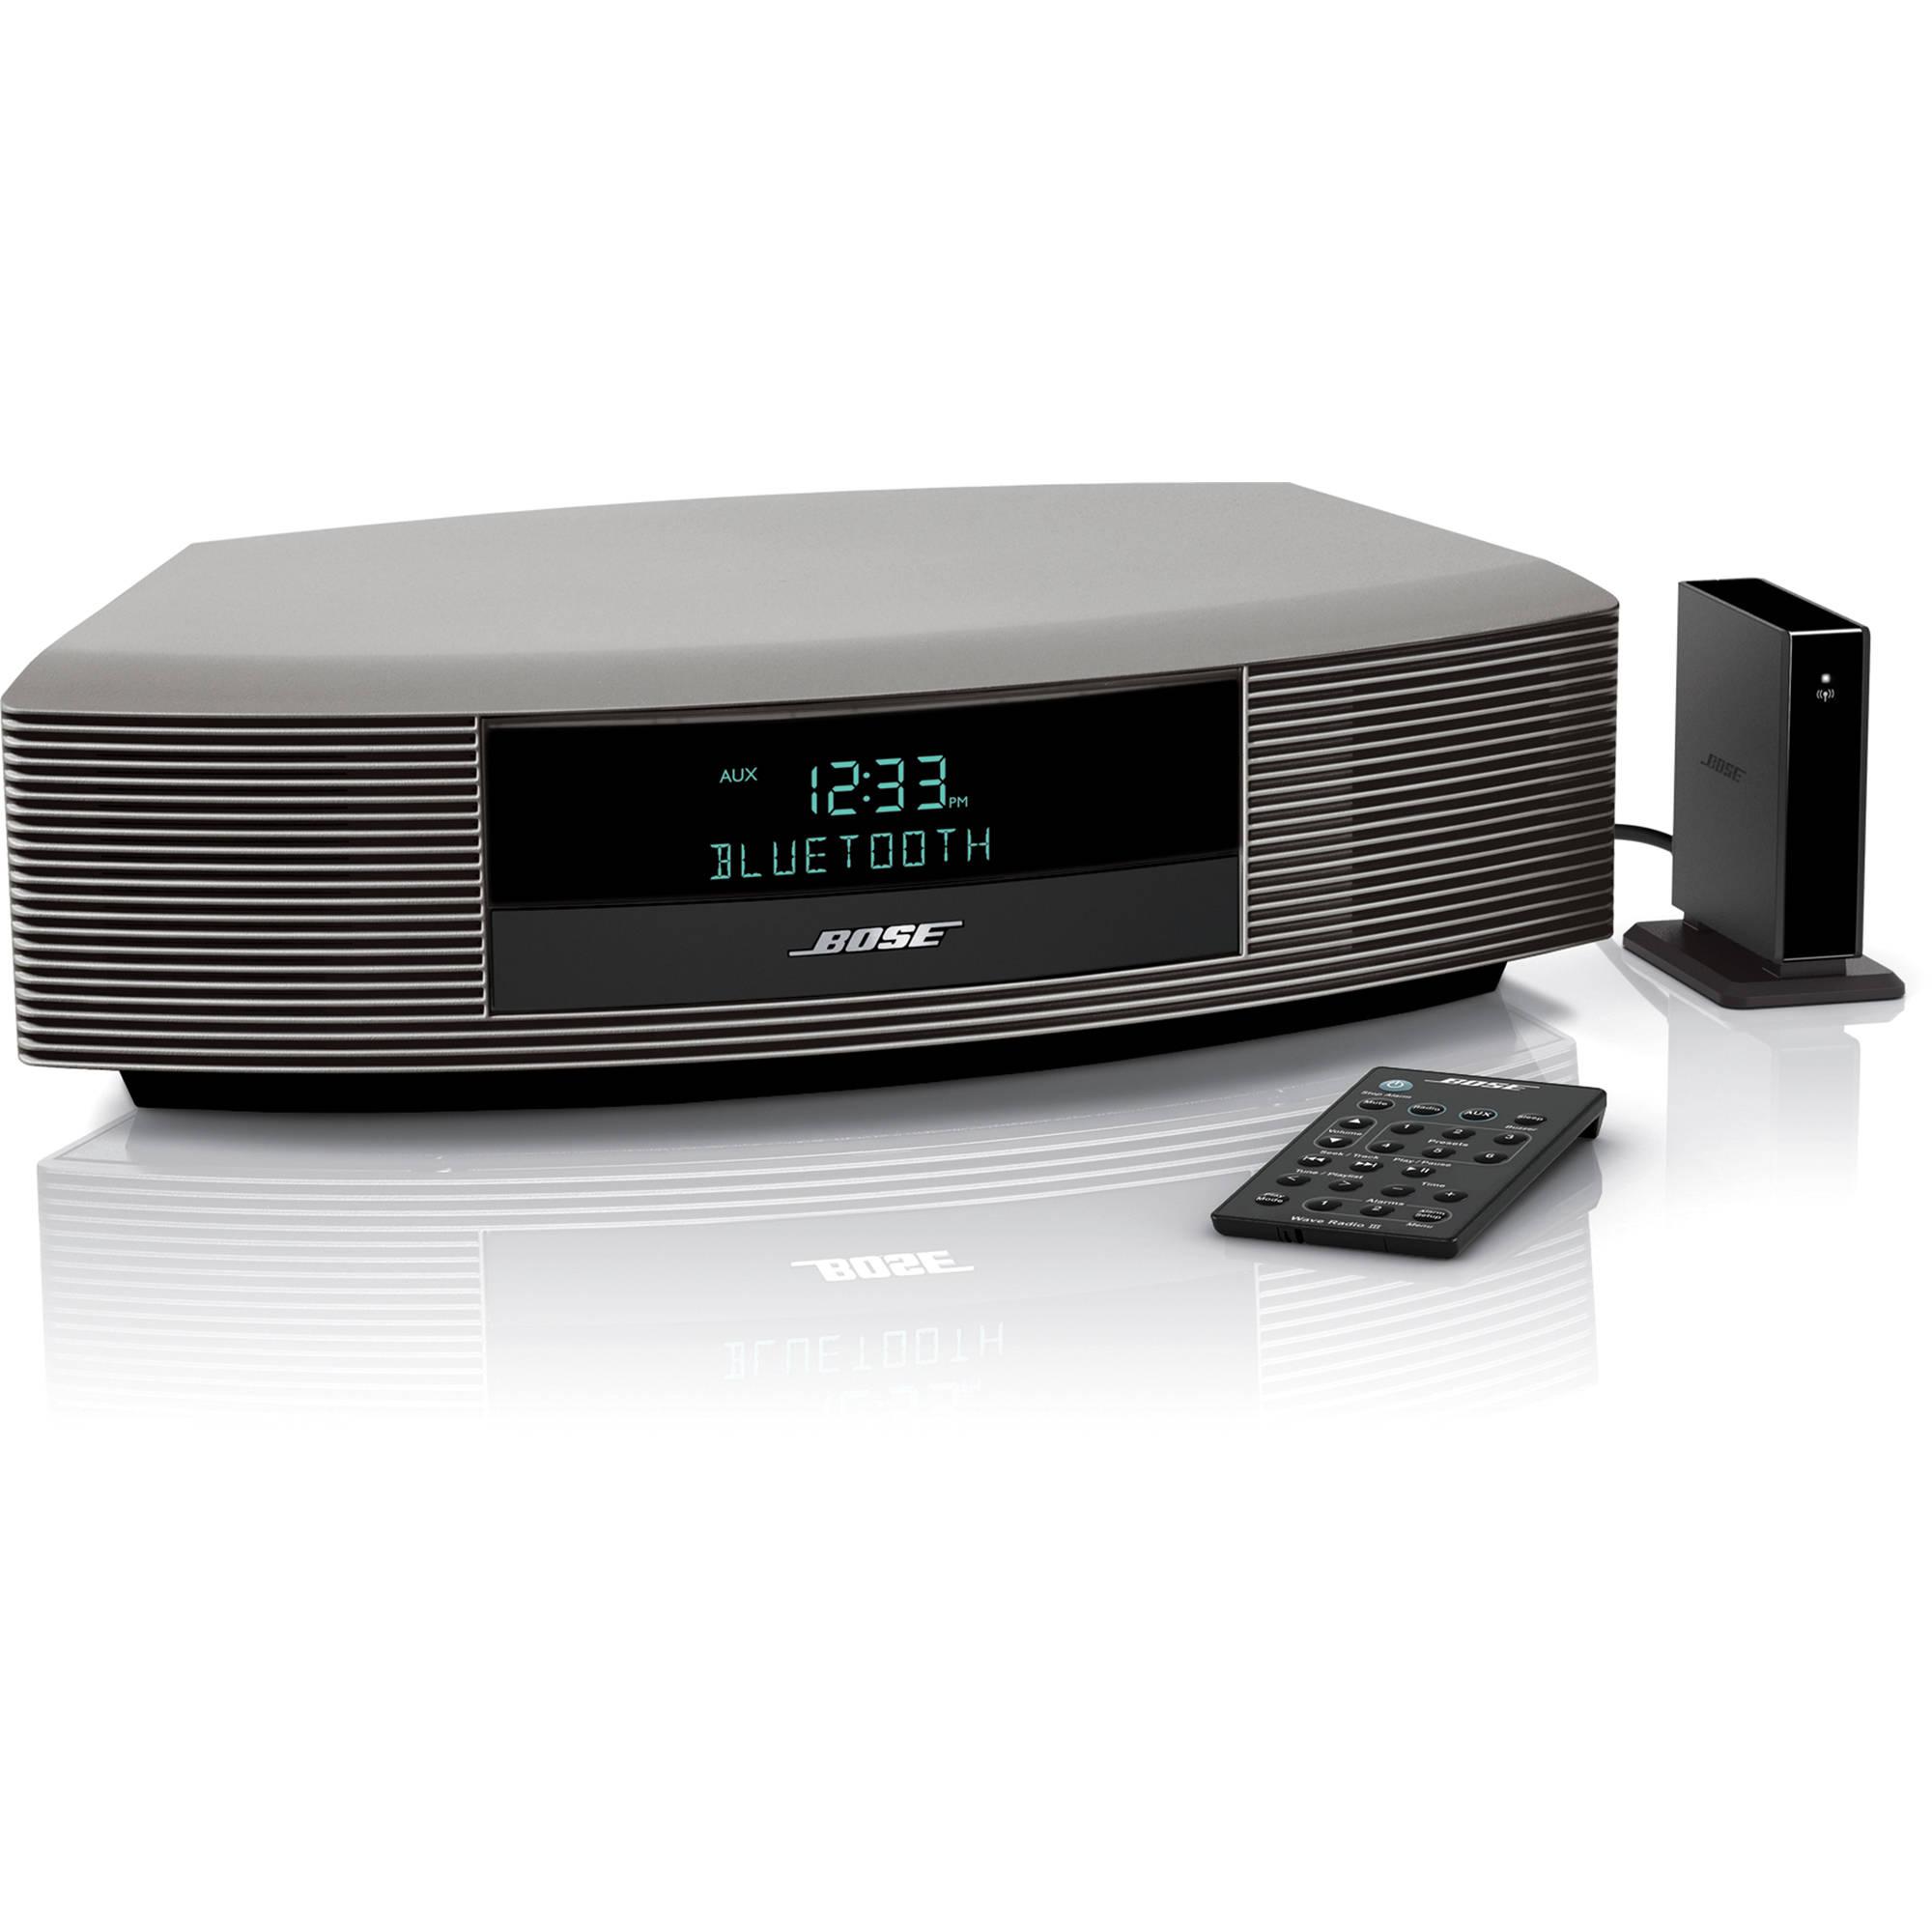 bose wave radio iii with bluetooth music adapter titanium. Black Bedroom Furniture Sets. Home Design Ideas